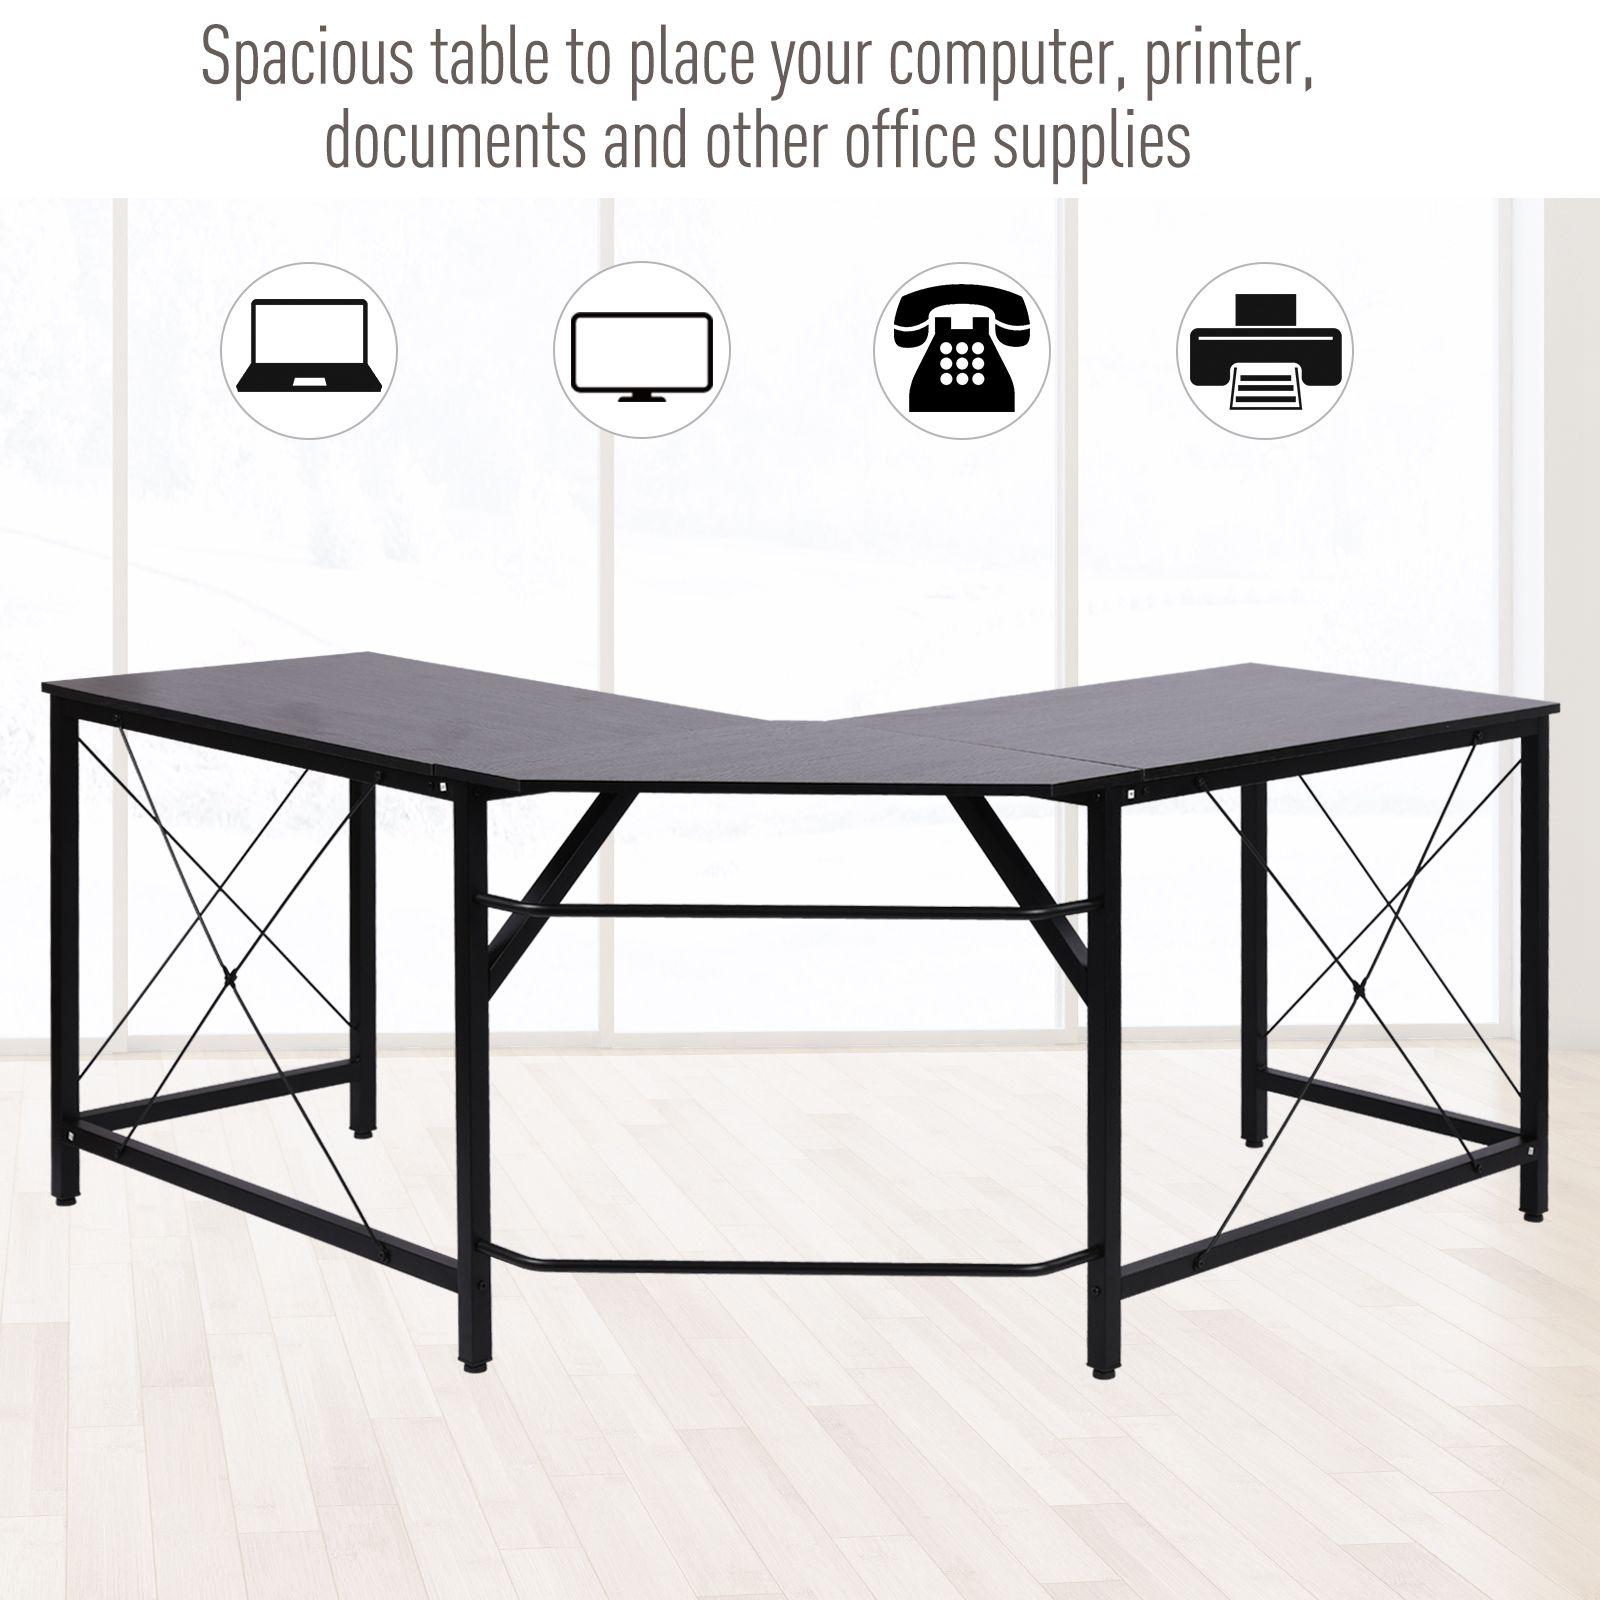 L-Shaped-Computer-Desk-Office-Wood-Corner-PC-Workstation-Large-Gaming-Desk-Table miniature 4